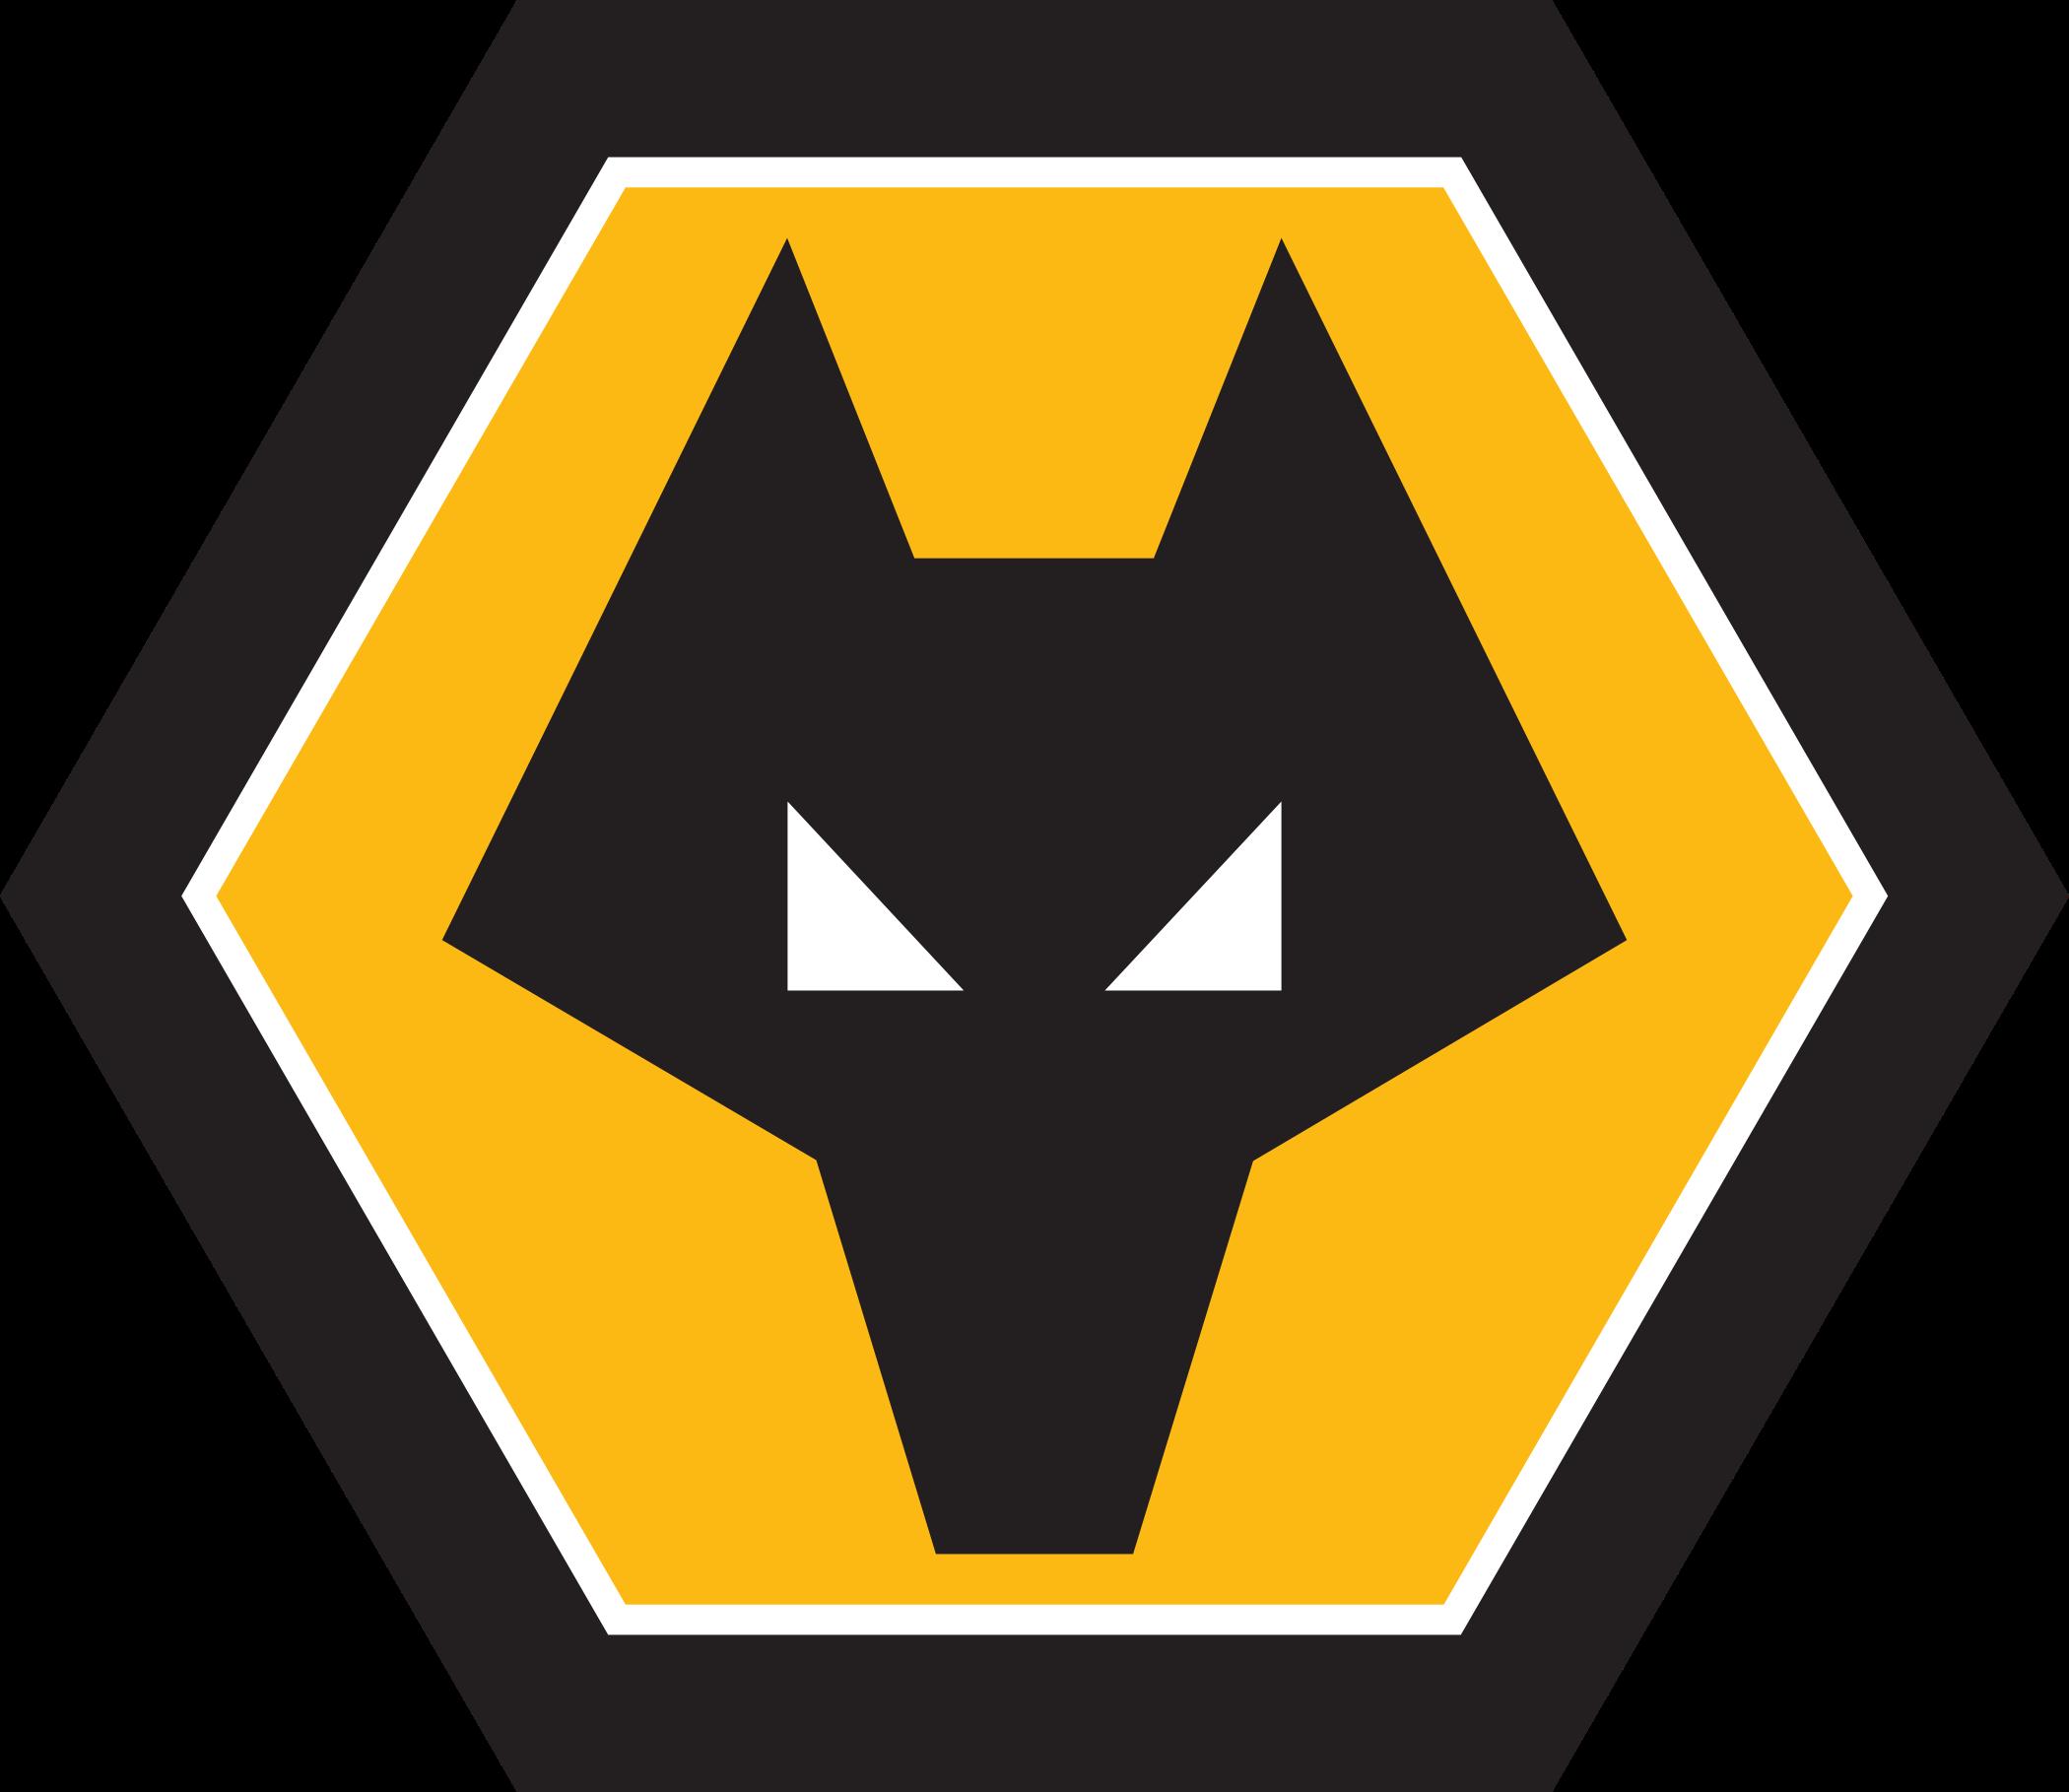 wolverhampton logo escudo 1 - Wolverhampton FC Logo